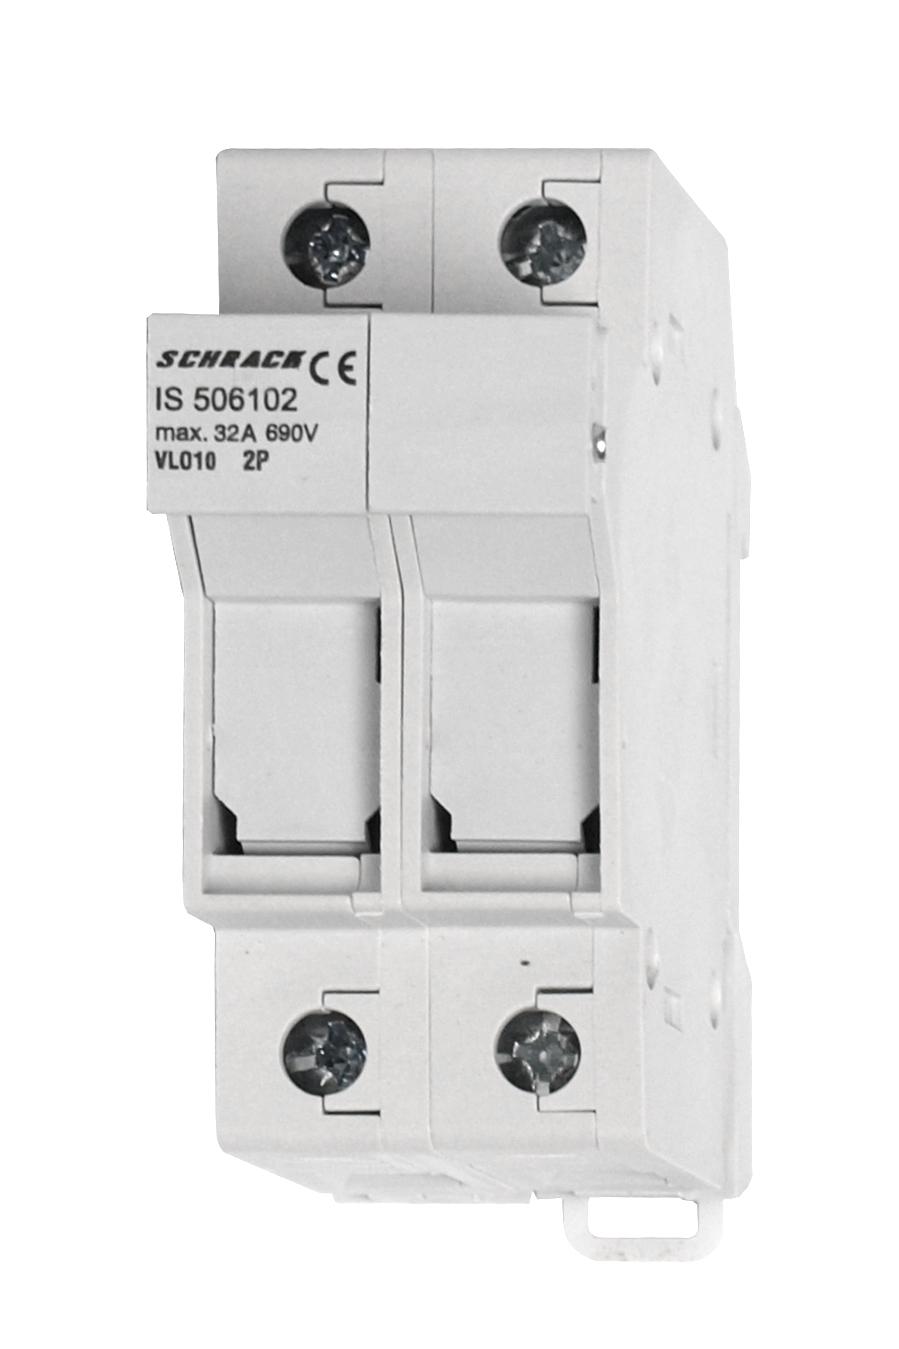 1 Stk Sicherungstrennschalter 10x38mm, 2-polig, 32A IS506102--